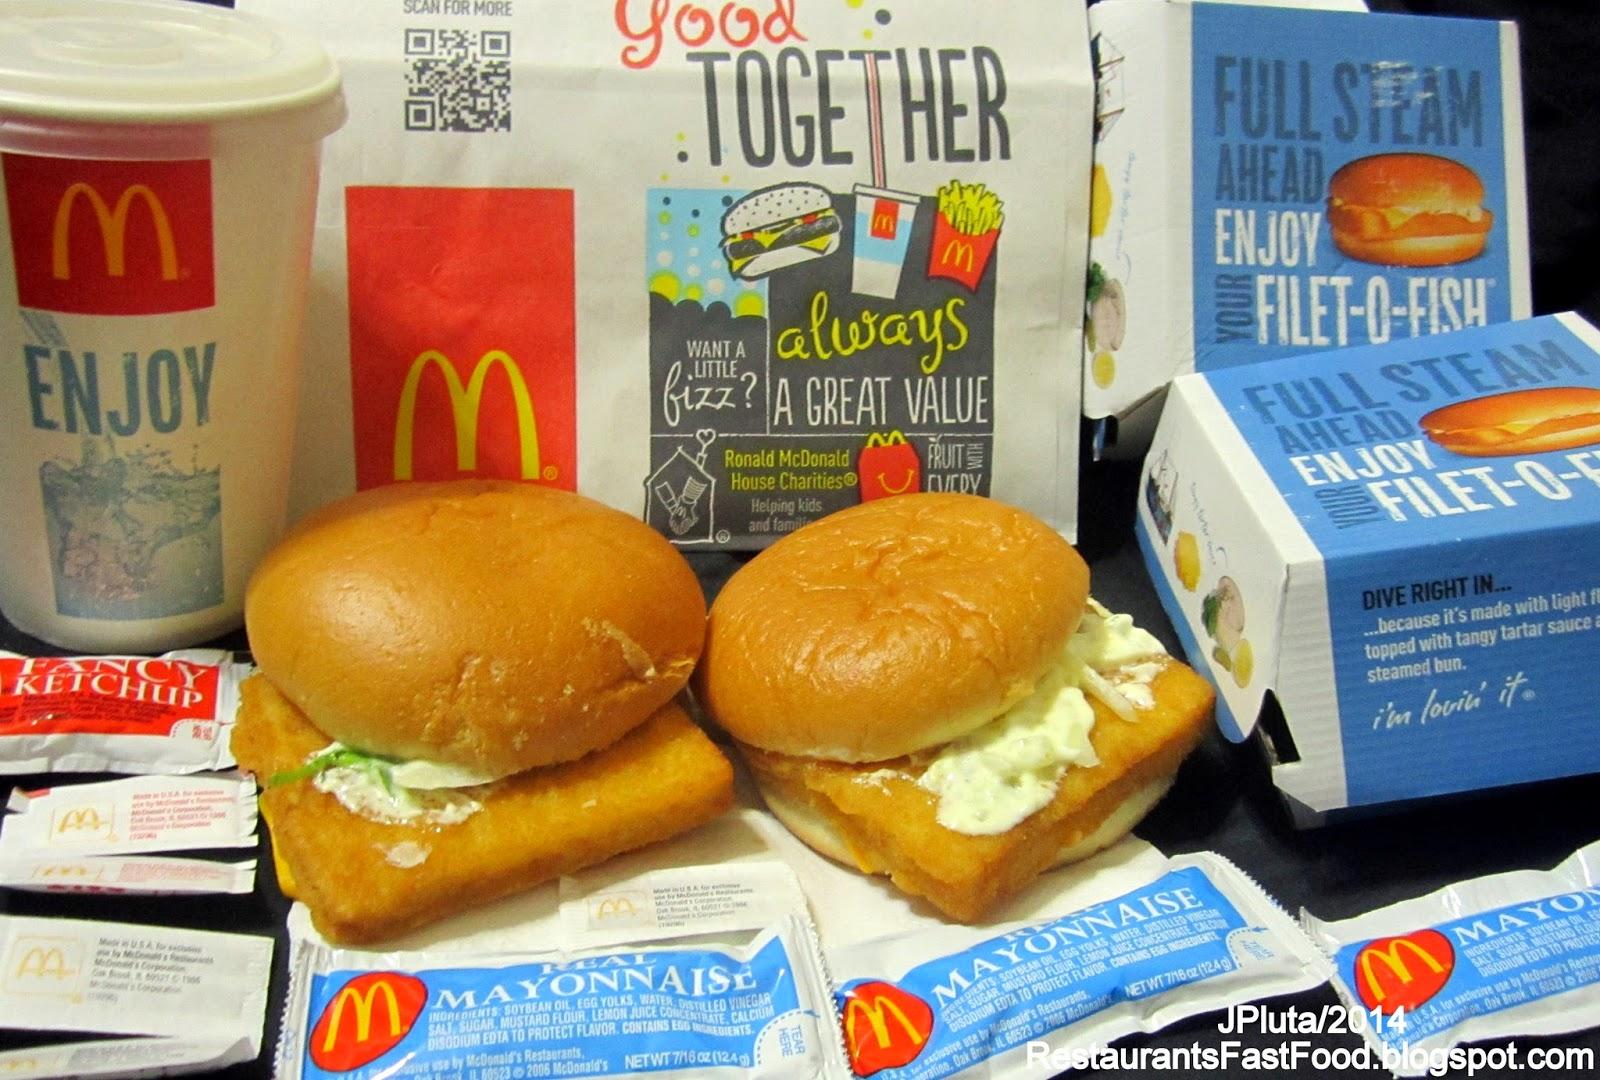 Phenix city alabama russell ctystaurant bank drhospital church mcdonalds fast food hamburger restaurant fish sandwich filet o fish mcfish publicscrutiny Image collections